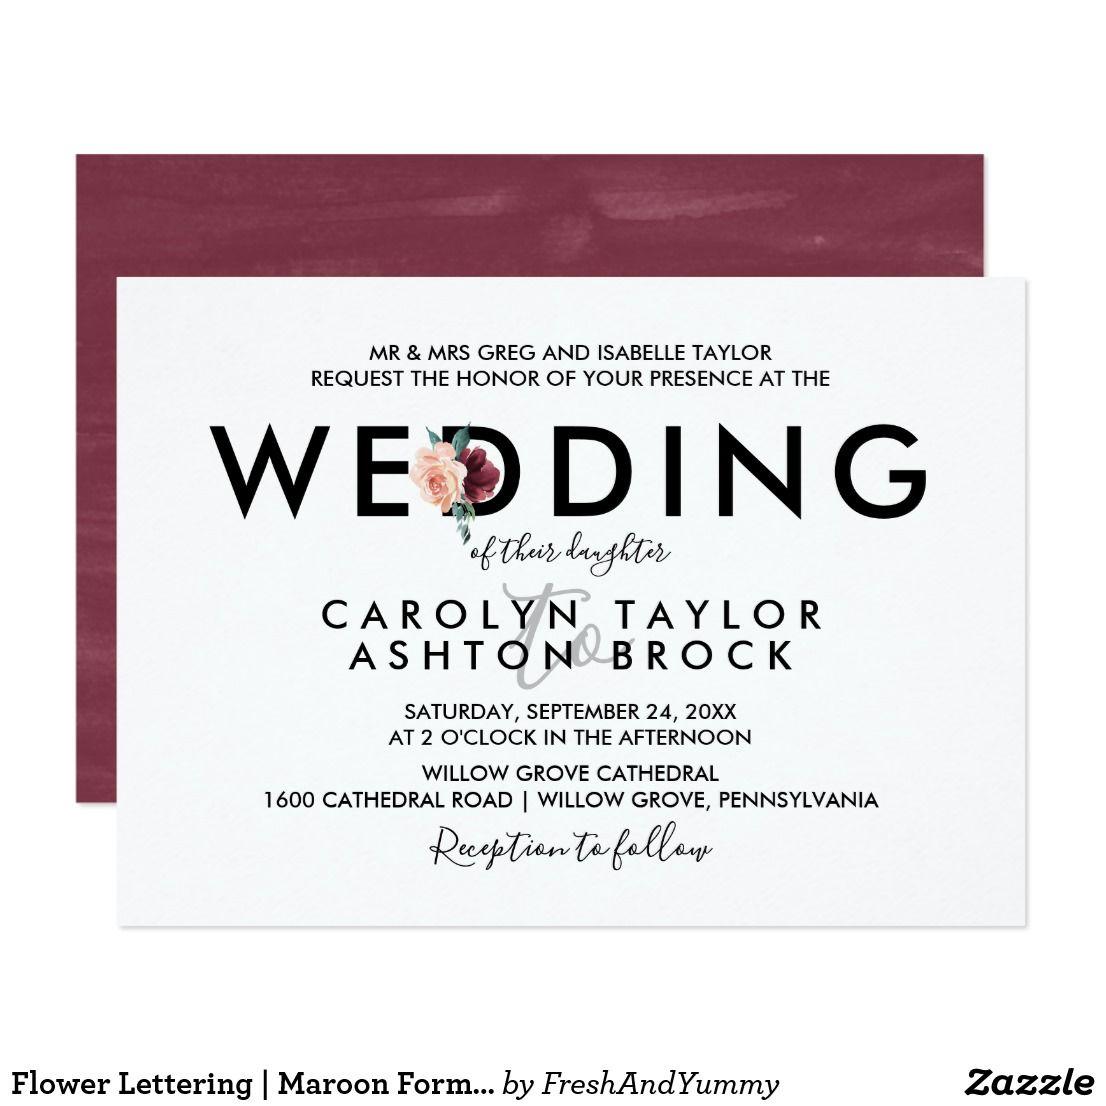 Flower Lettering Maroon Formal Wedding Card Formal Wedding